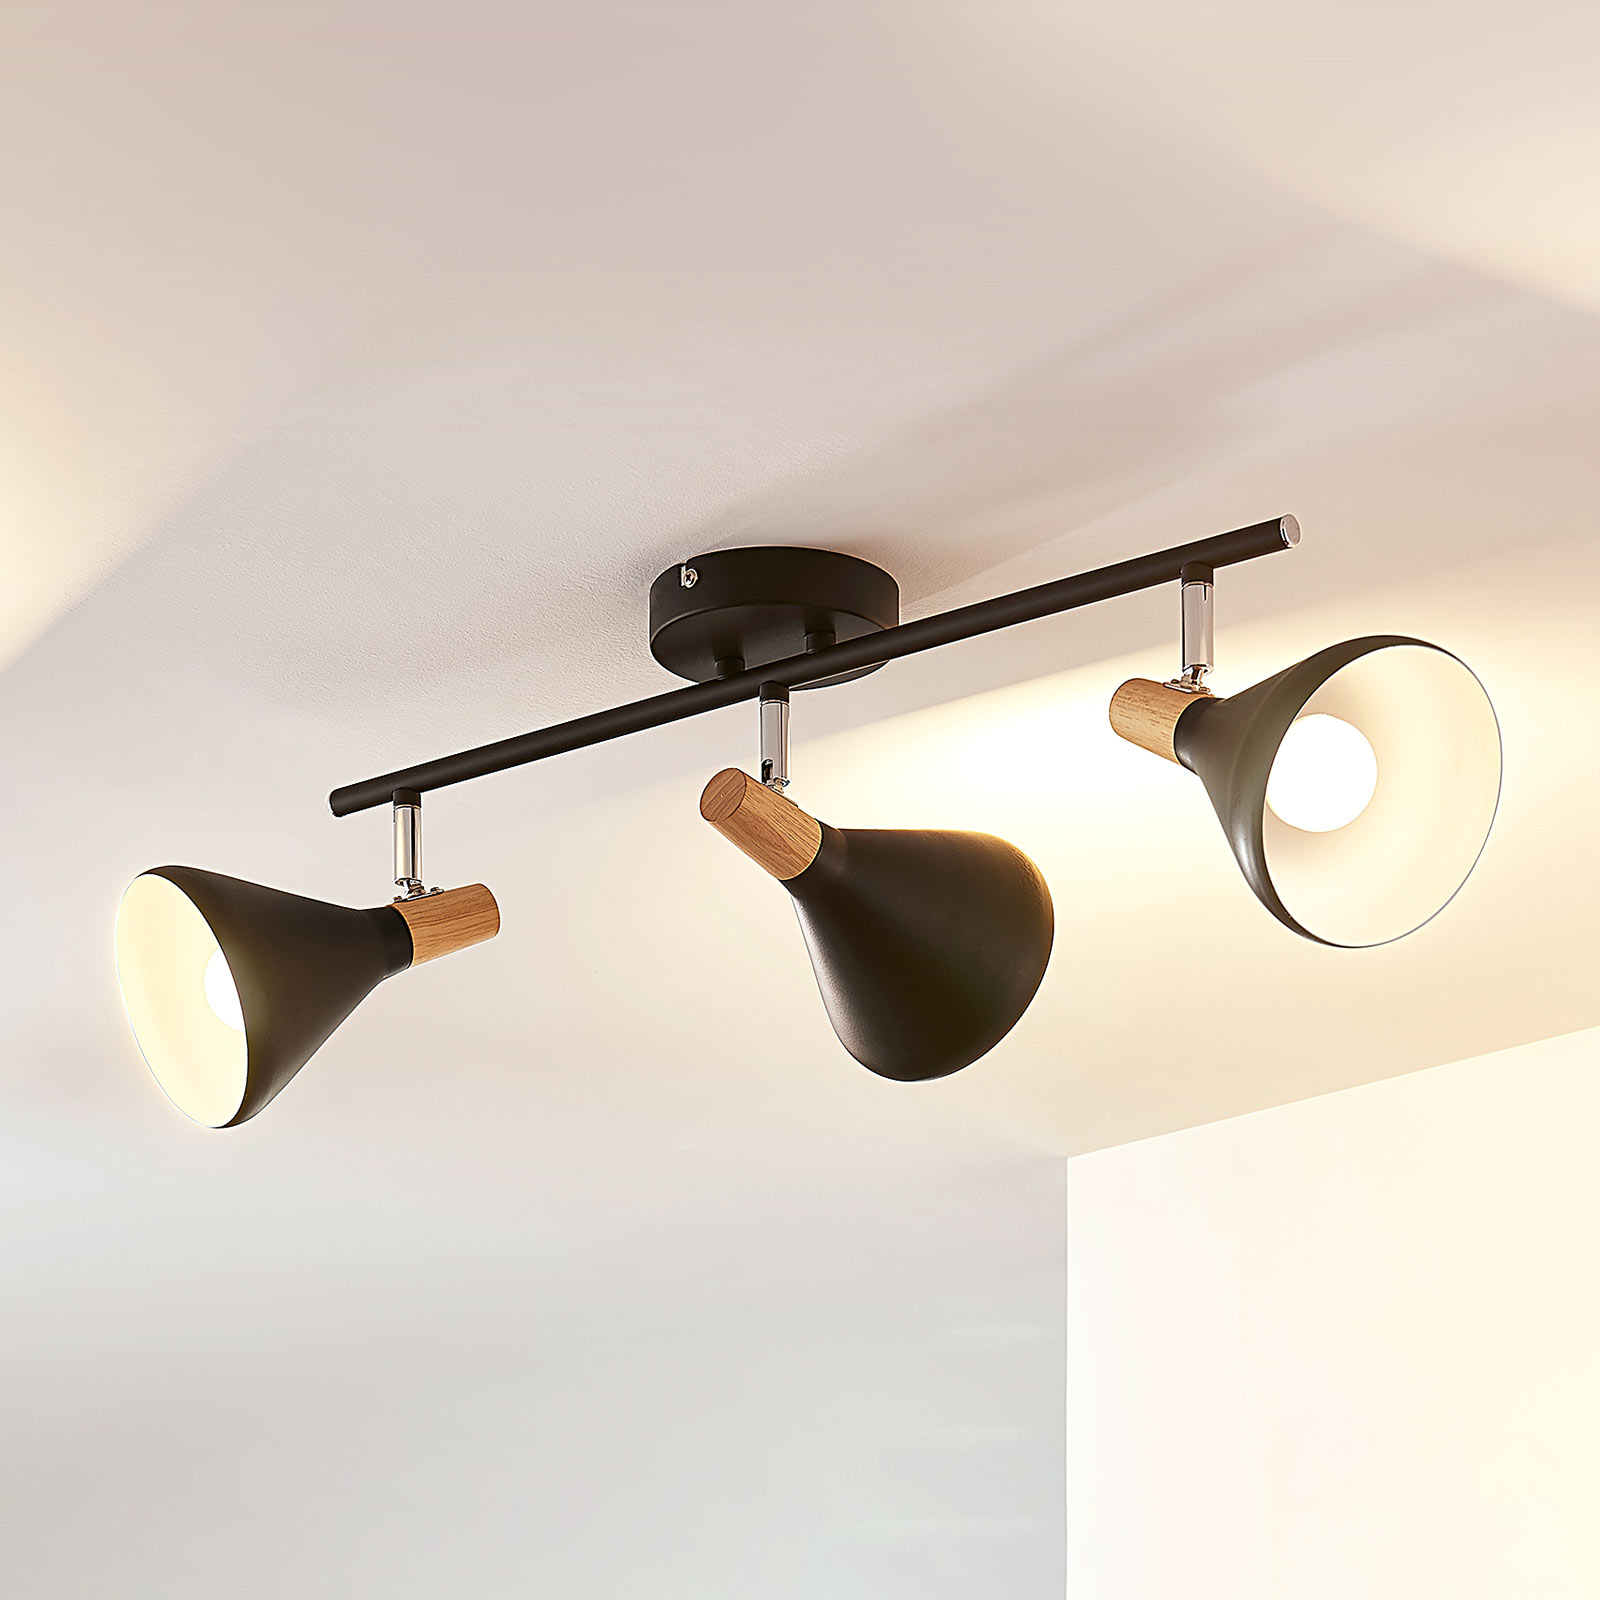 Lámpara LED de techo Arina, estilo escandinavo